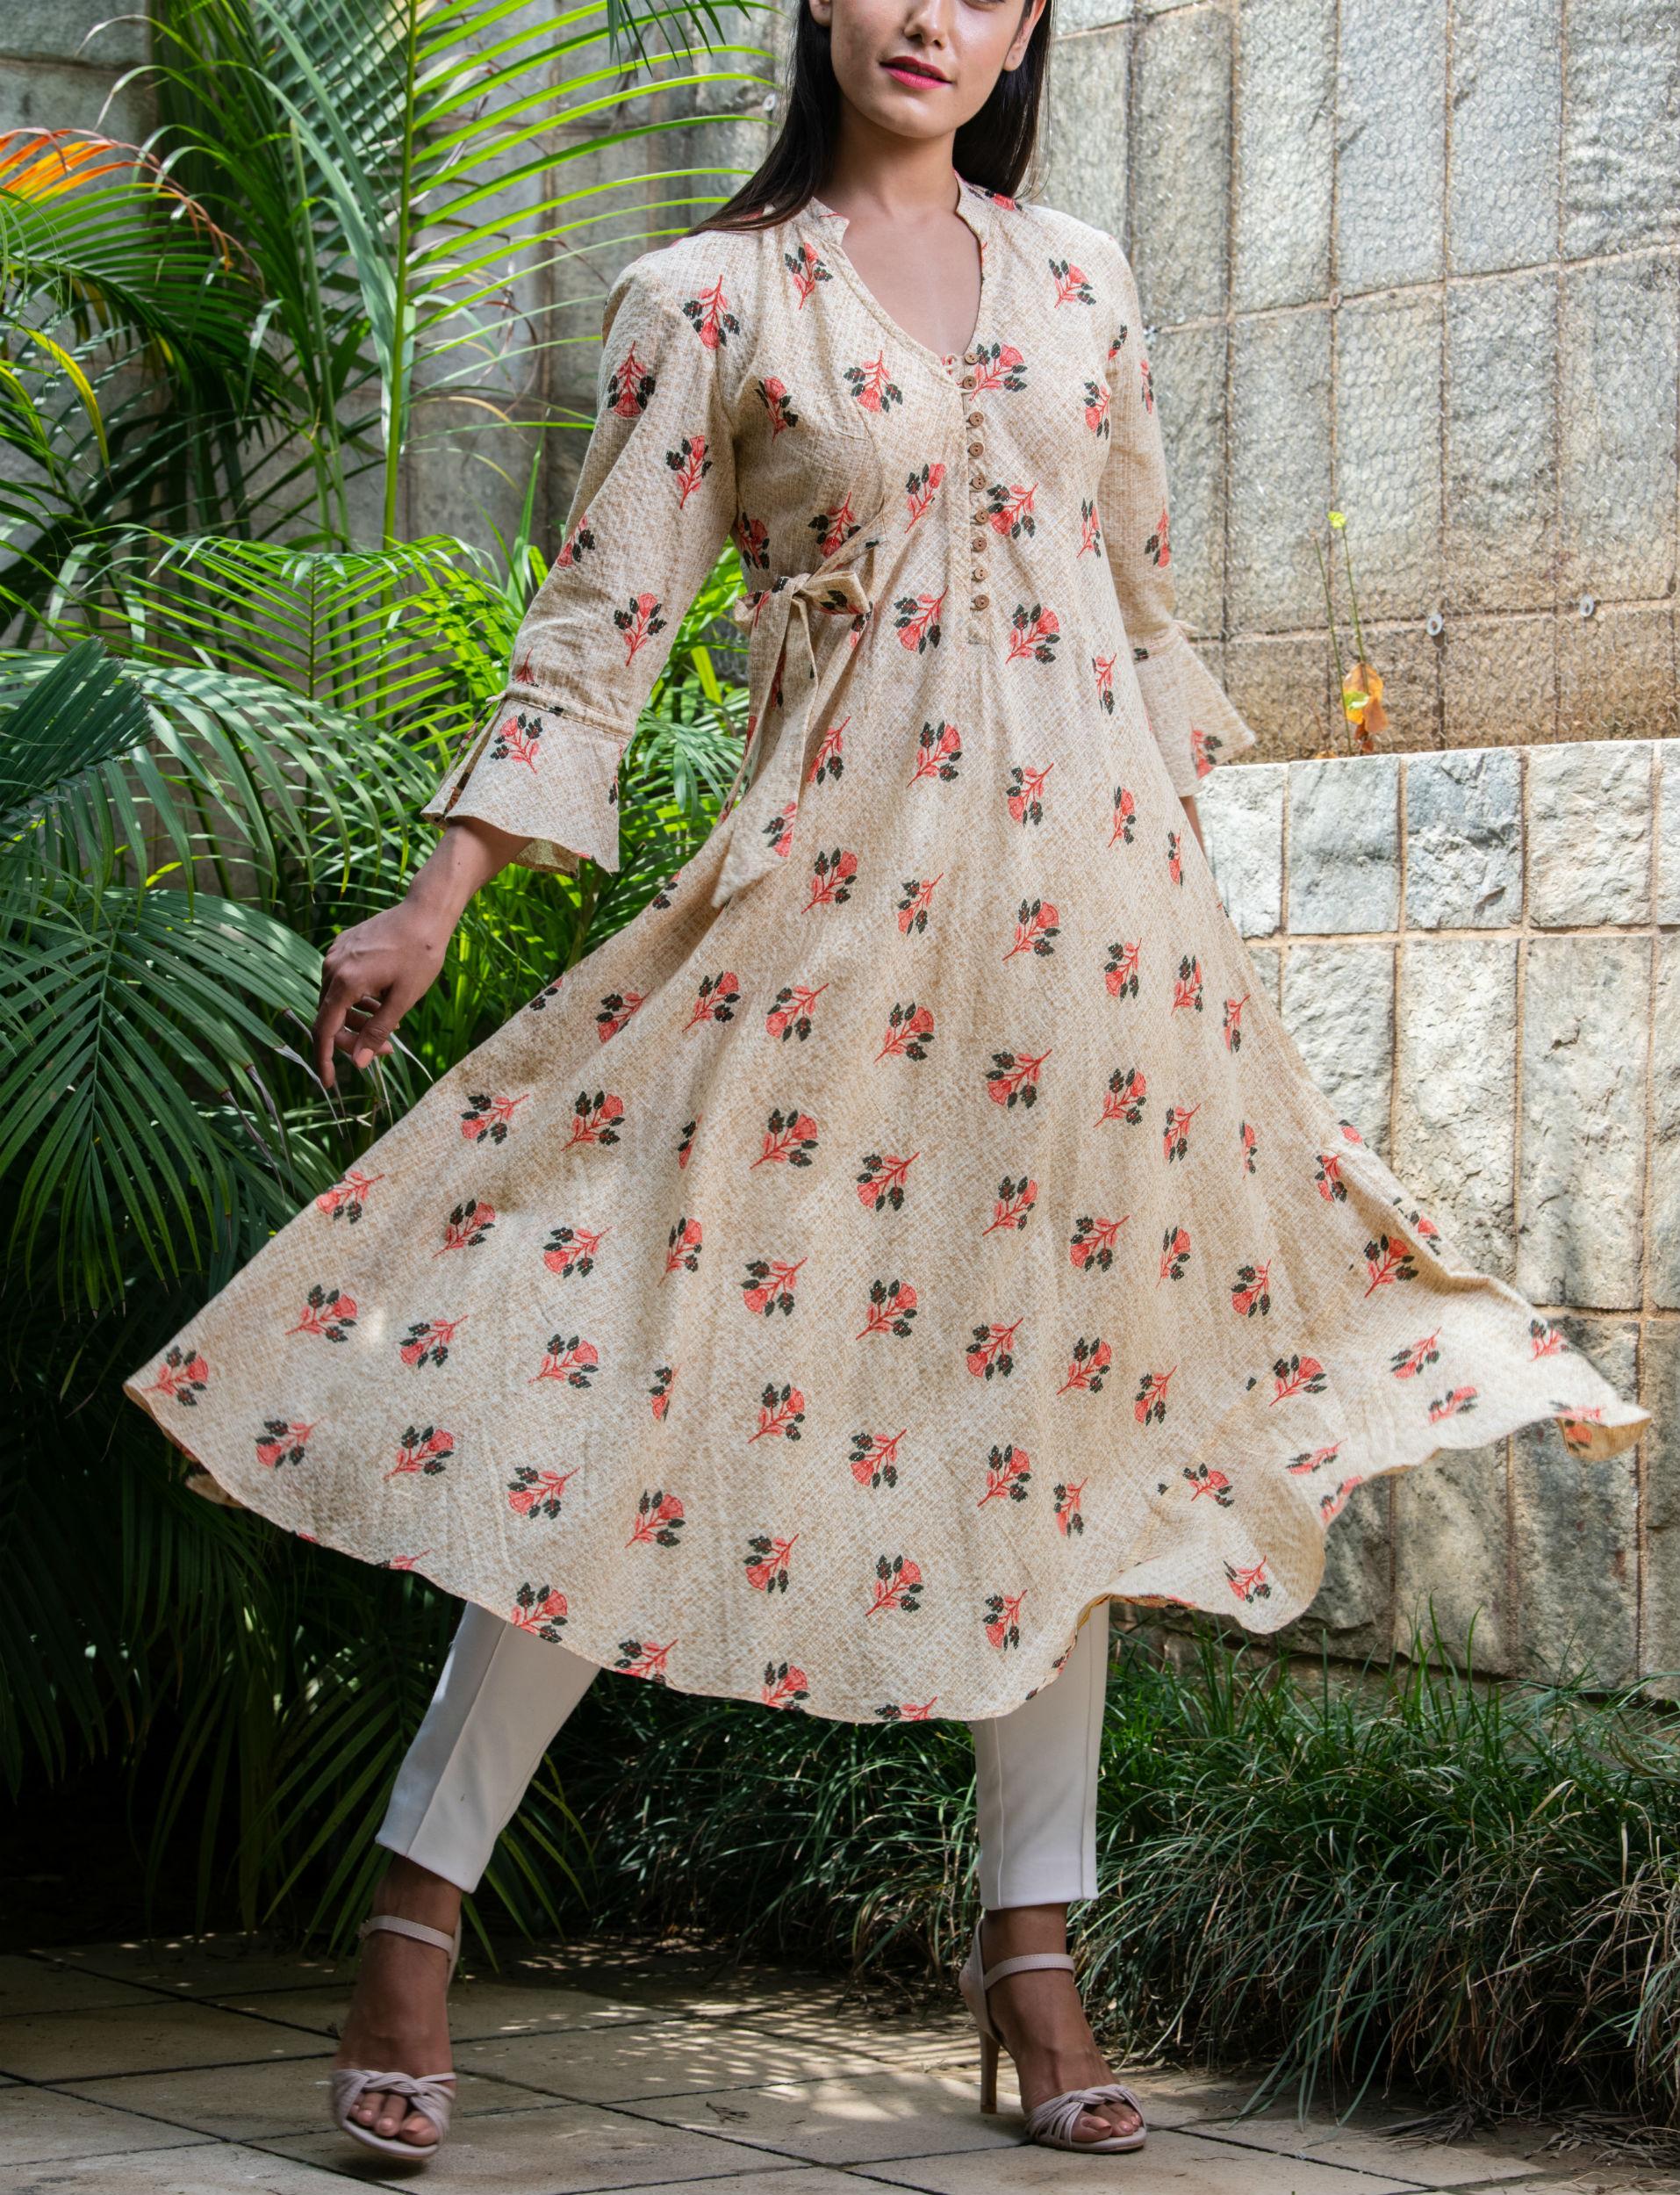 Textured swing dress